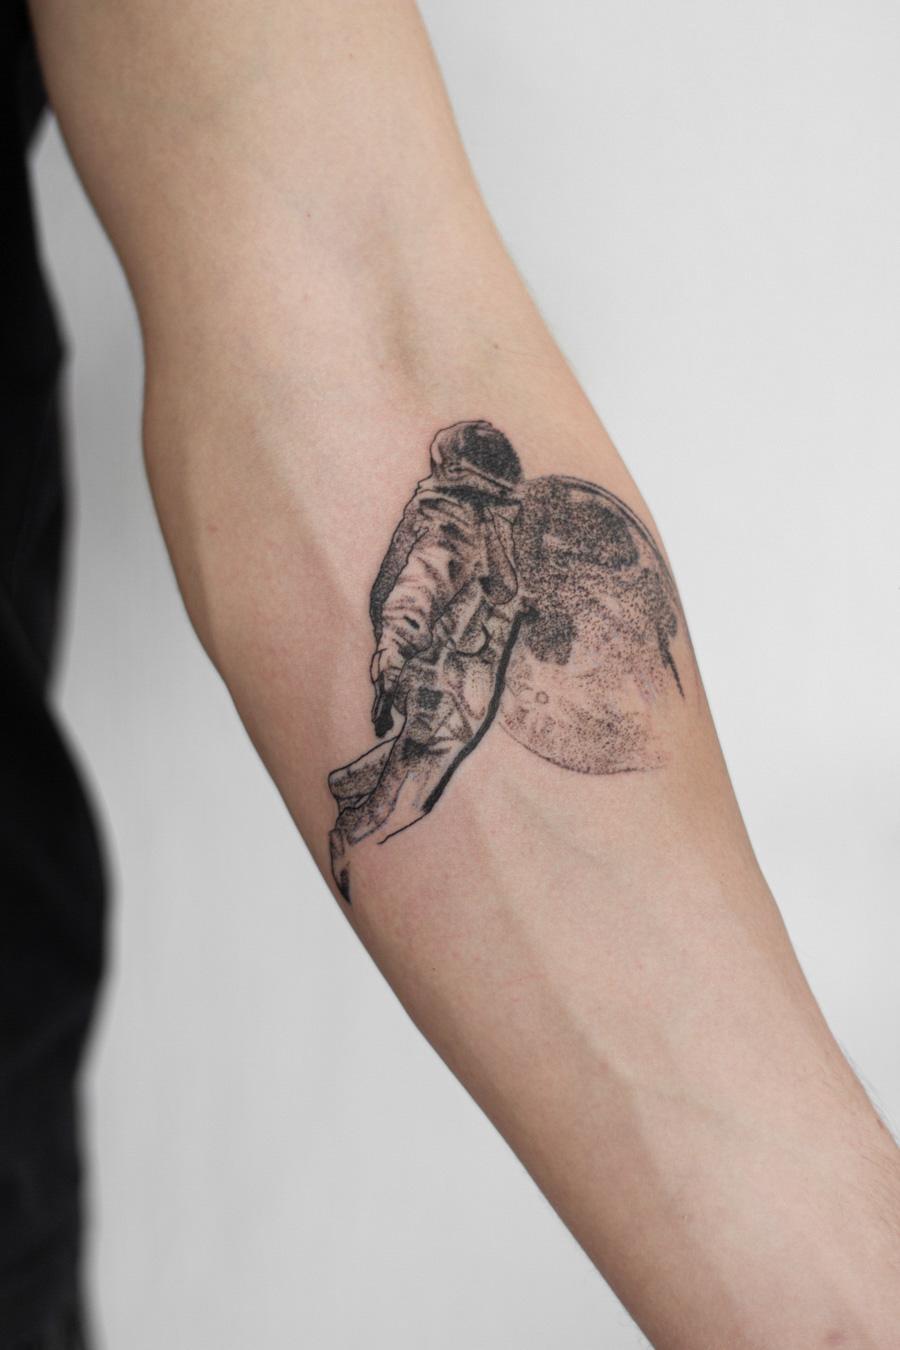 Inksearch tattoo Kaktus Ink